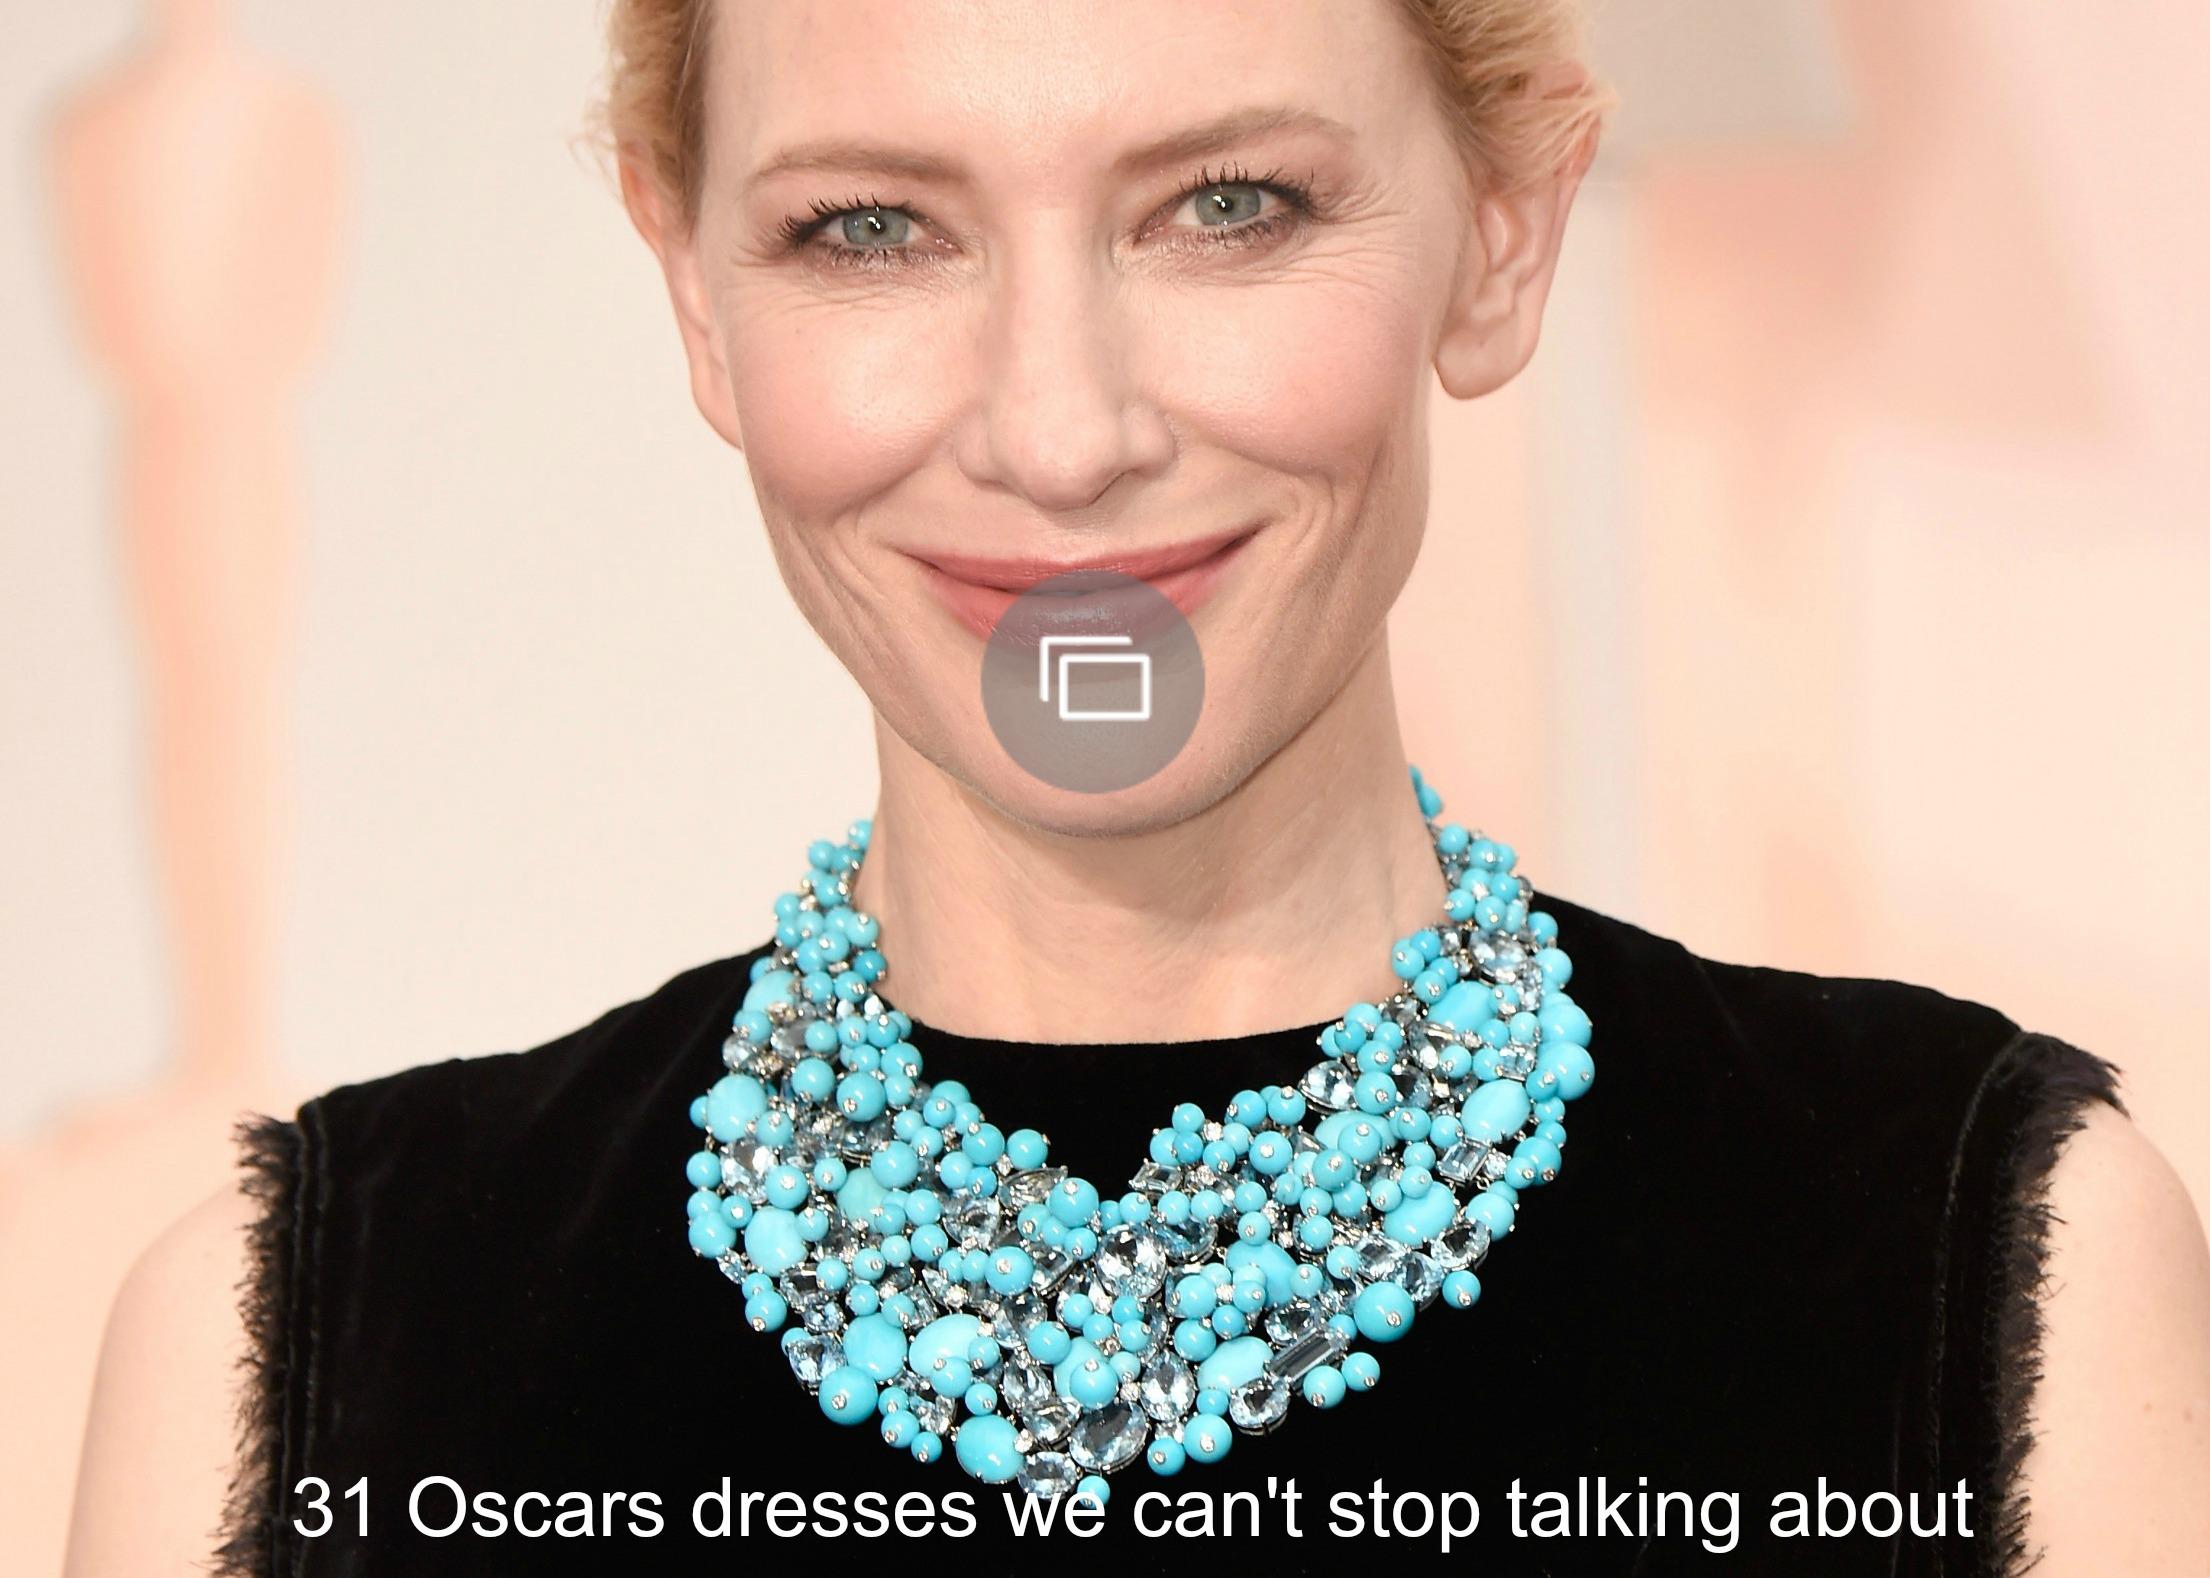 2015 Oscars dresses